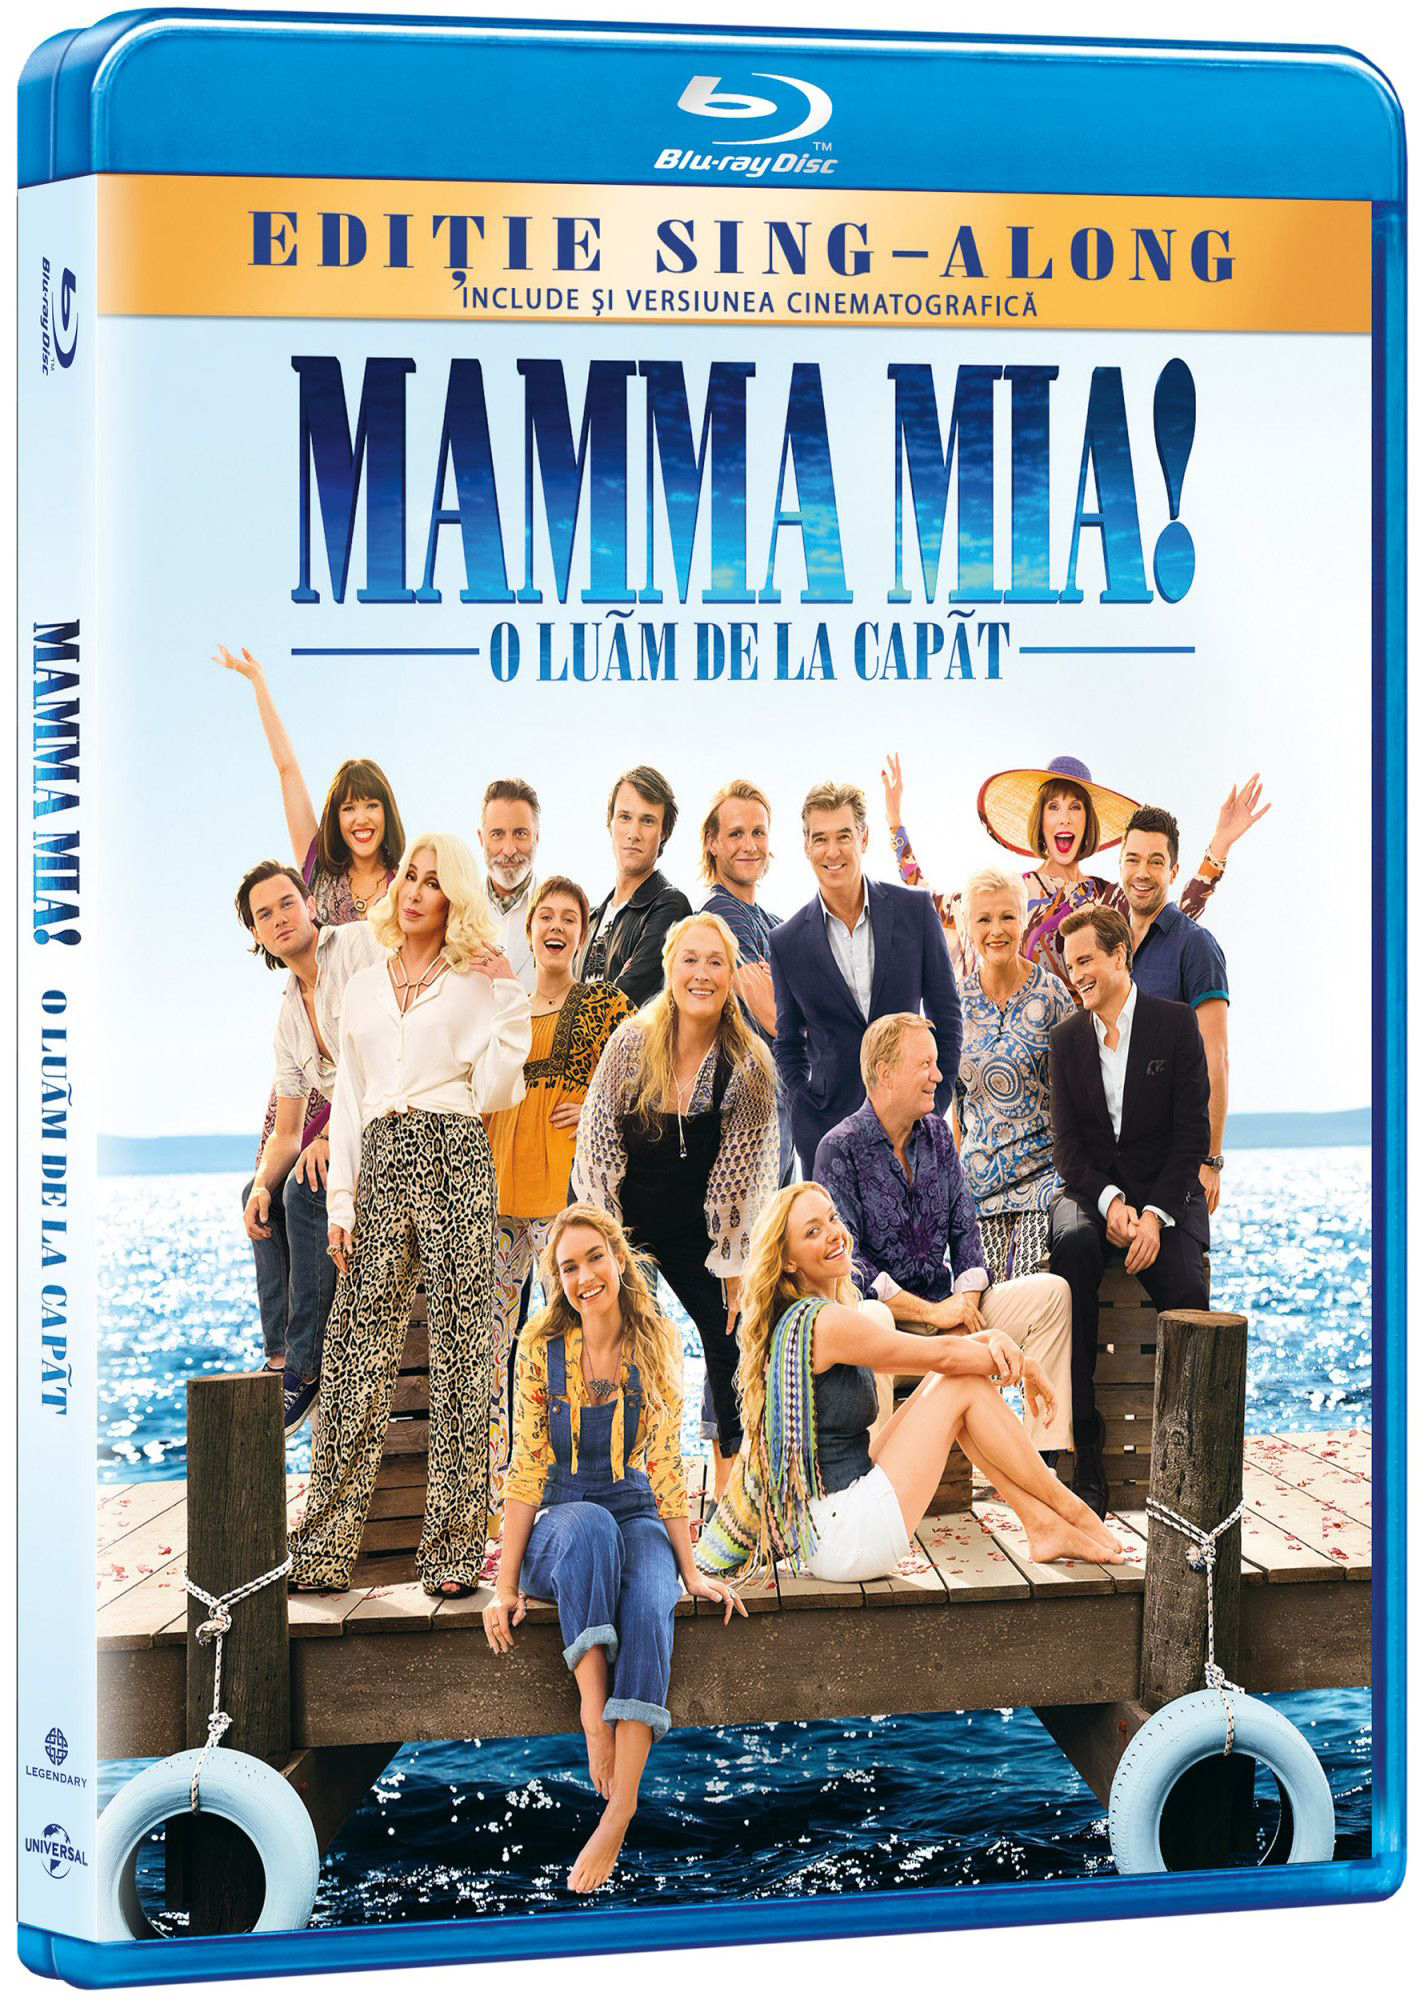 Mamma Mia! 2 - O Luam De La Capat / Mamma Mia! 2 - Here We Go Again (Blu Ray Disc) thumbnail